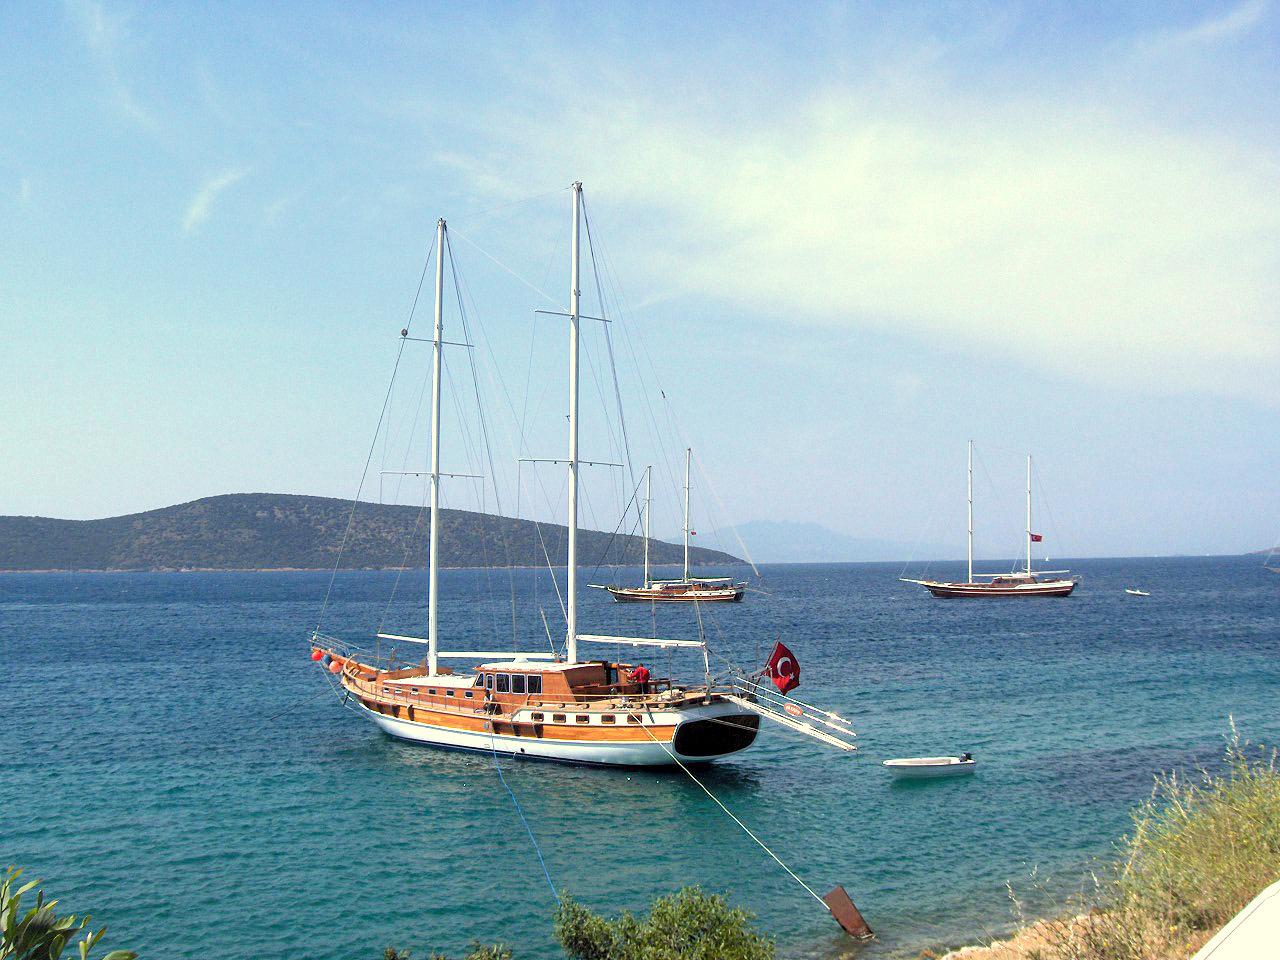 Galut Boat Bodrum Turkey